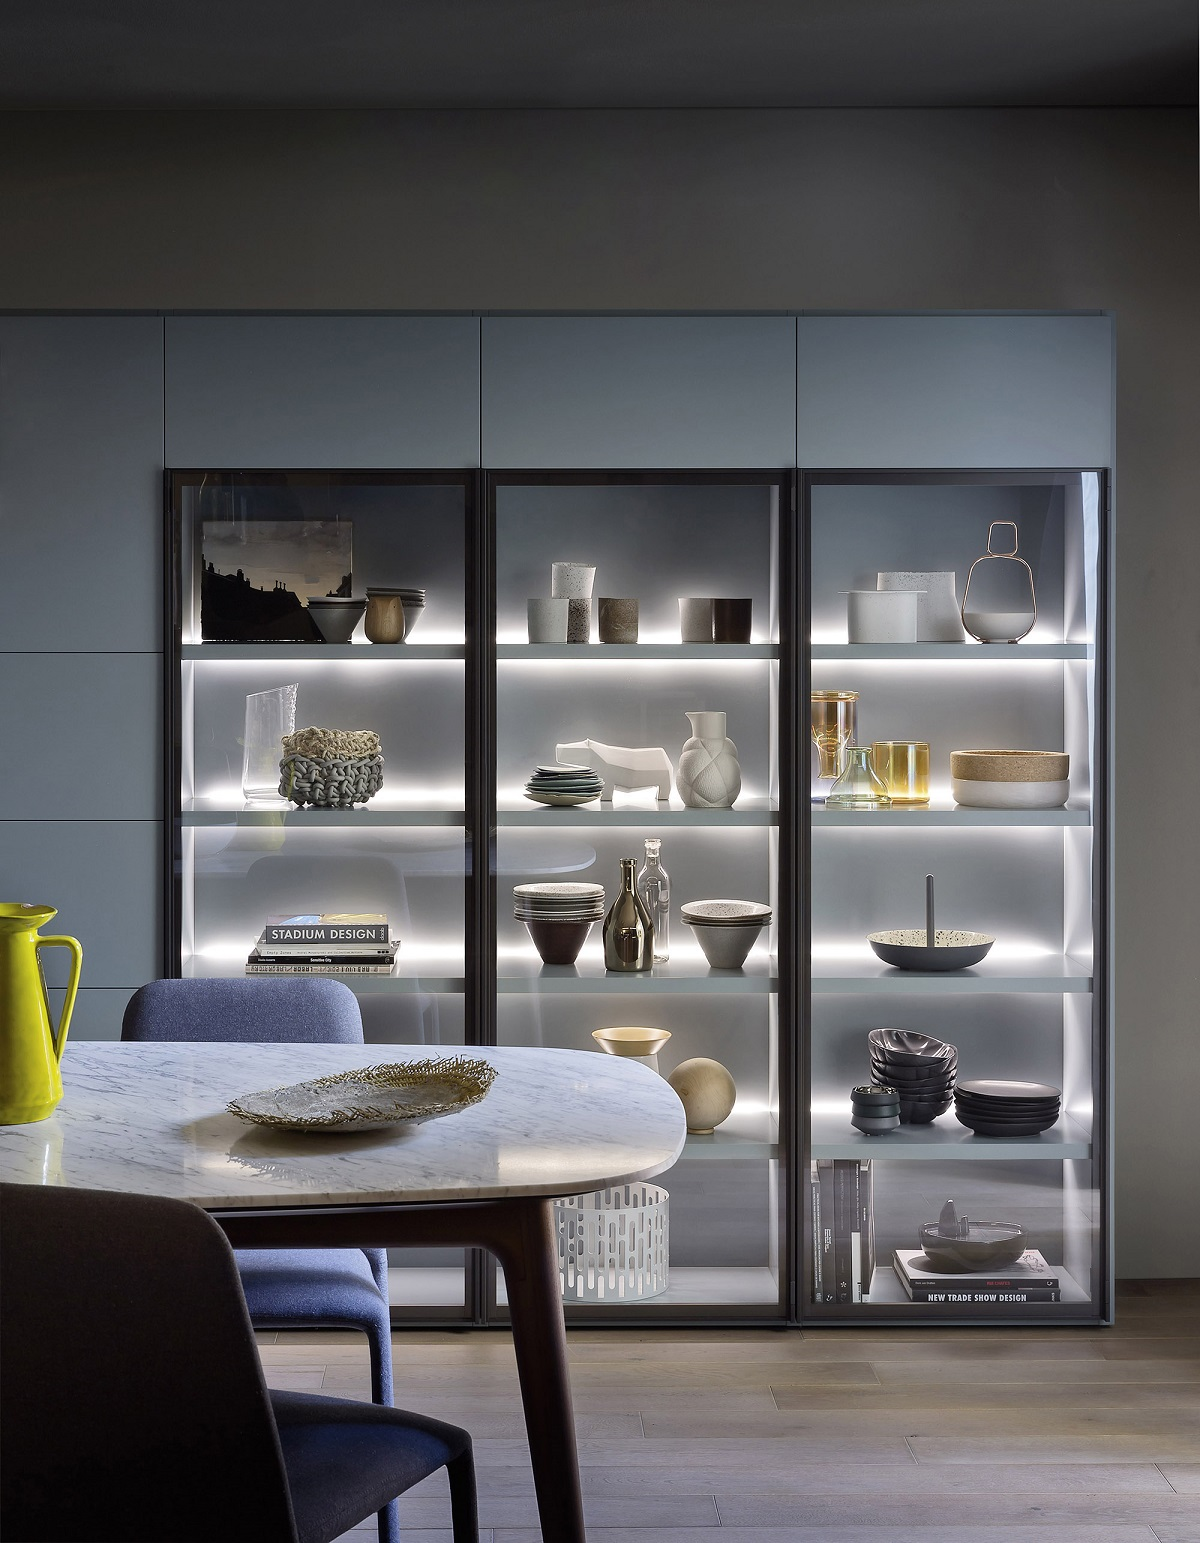 meubles composables wall30 novamobili vestibule paris5. Black Bedroom Furniture Sets. Home Design Ideas